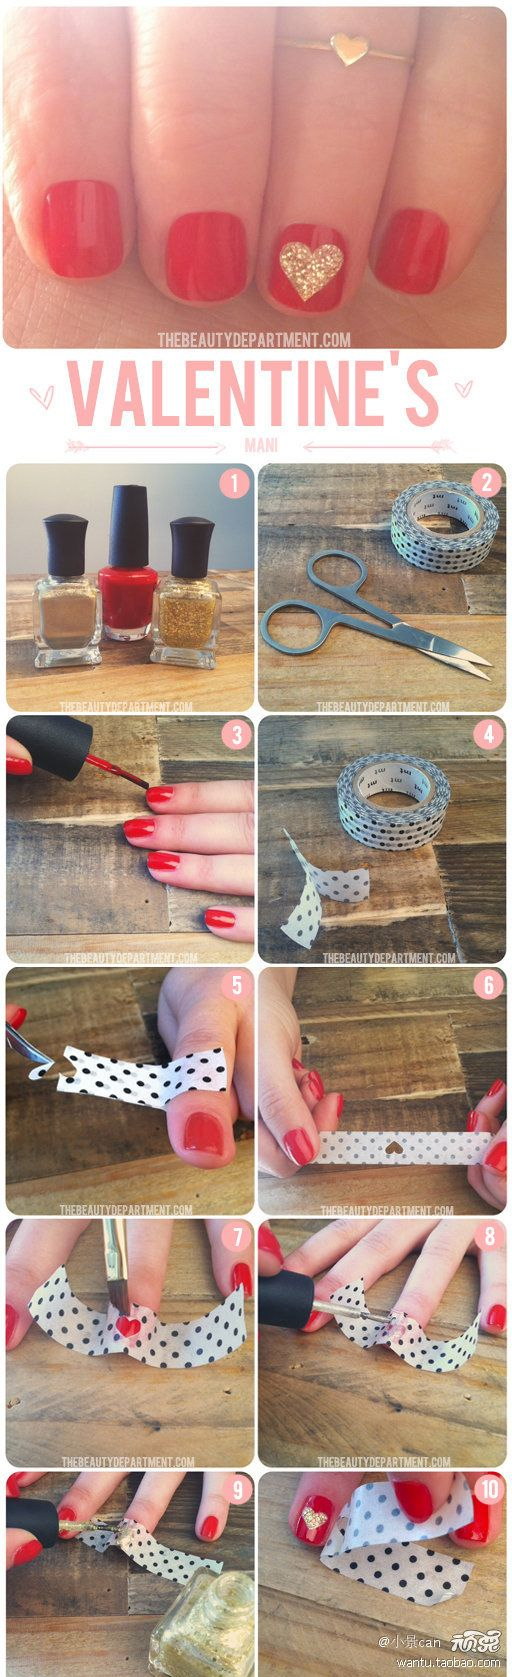 DIY Valentines Heart Nail